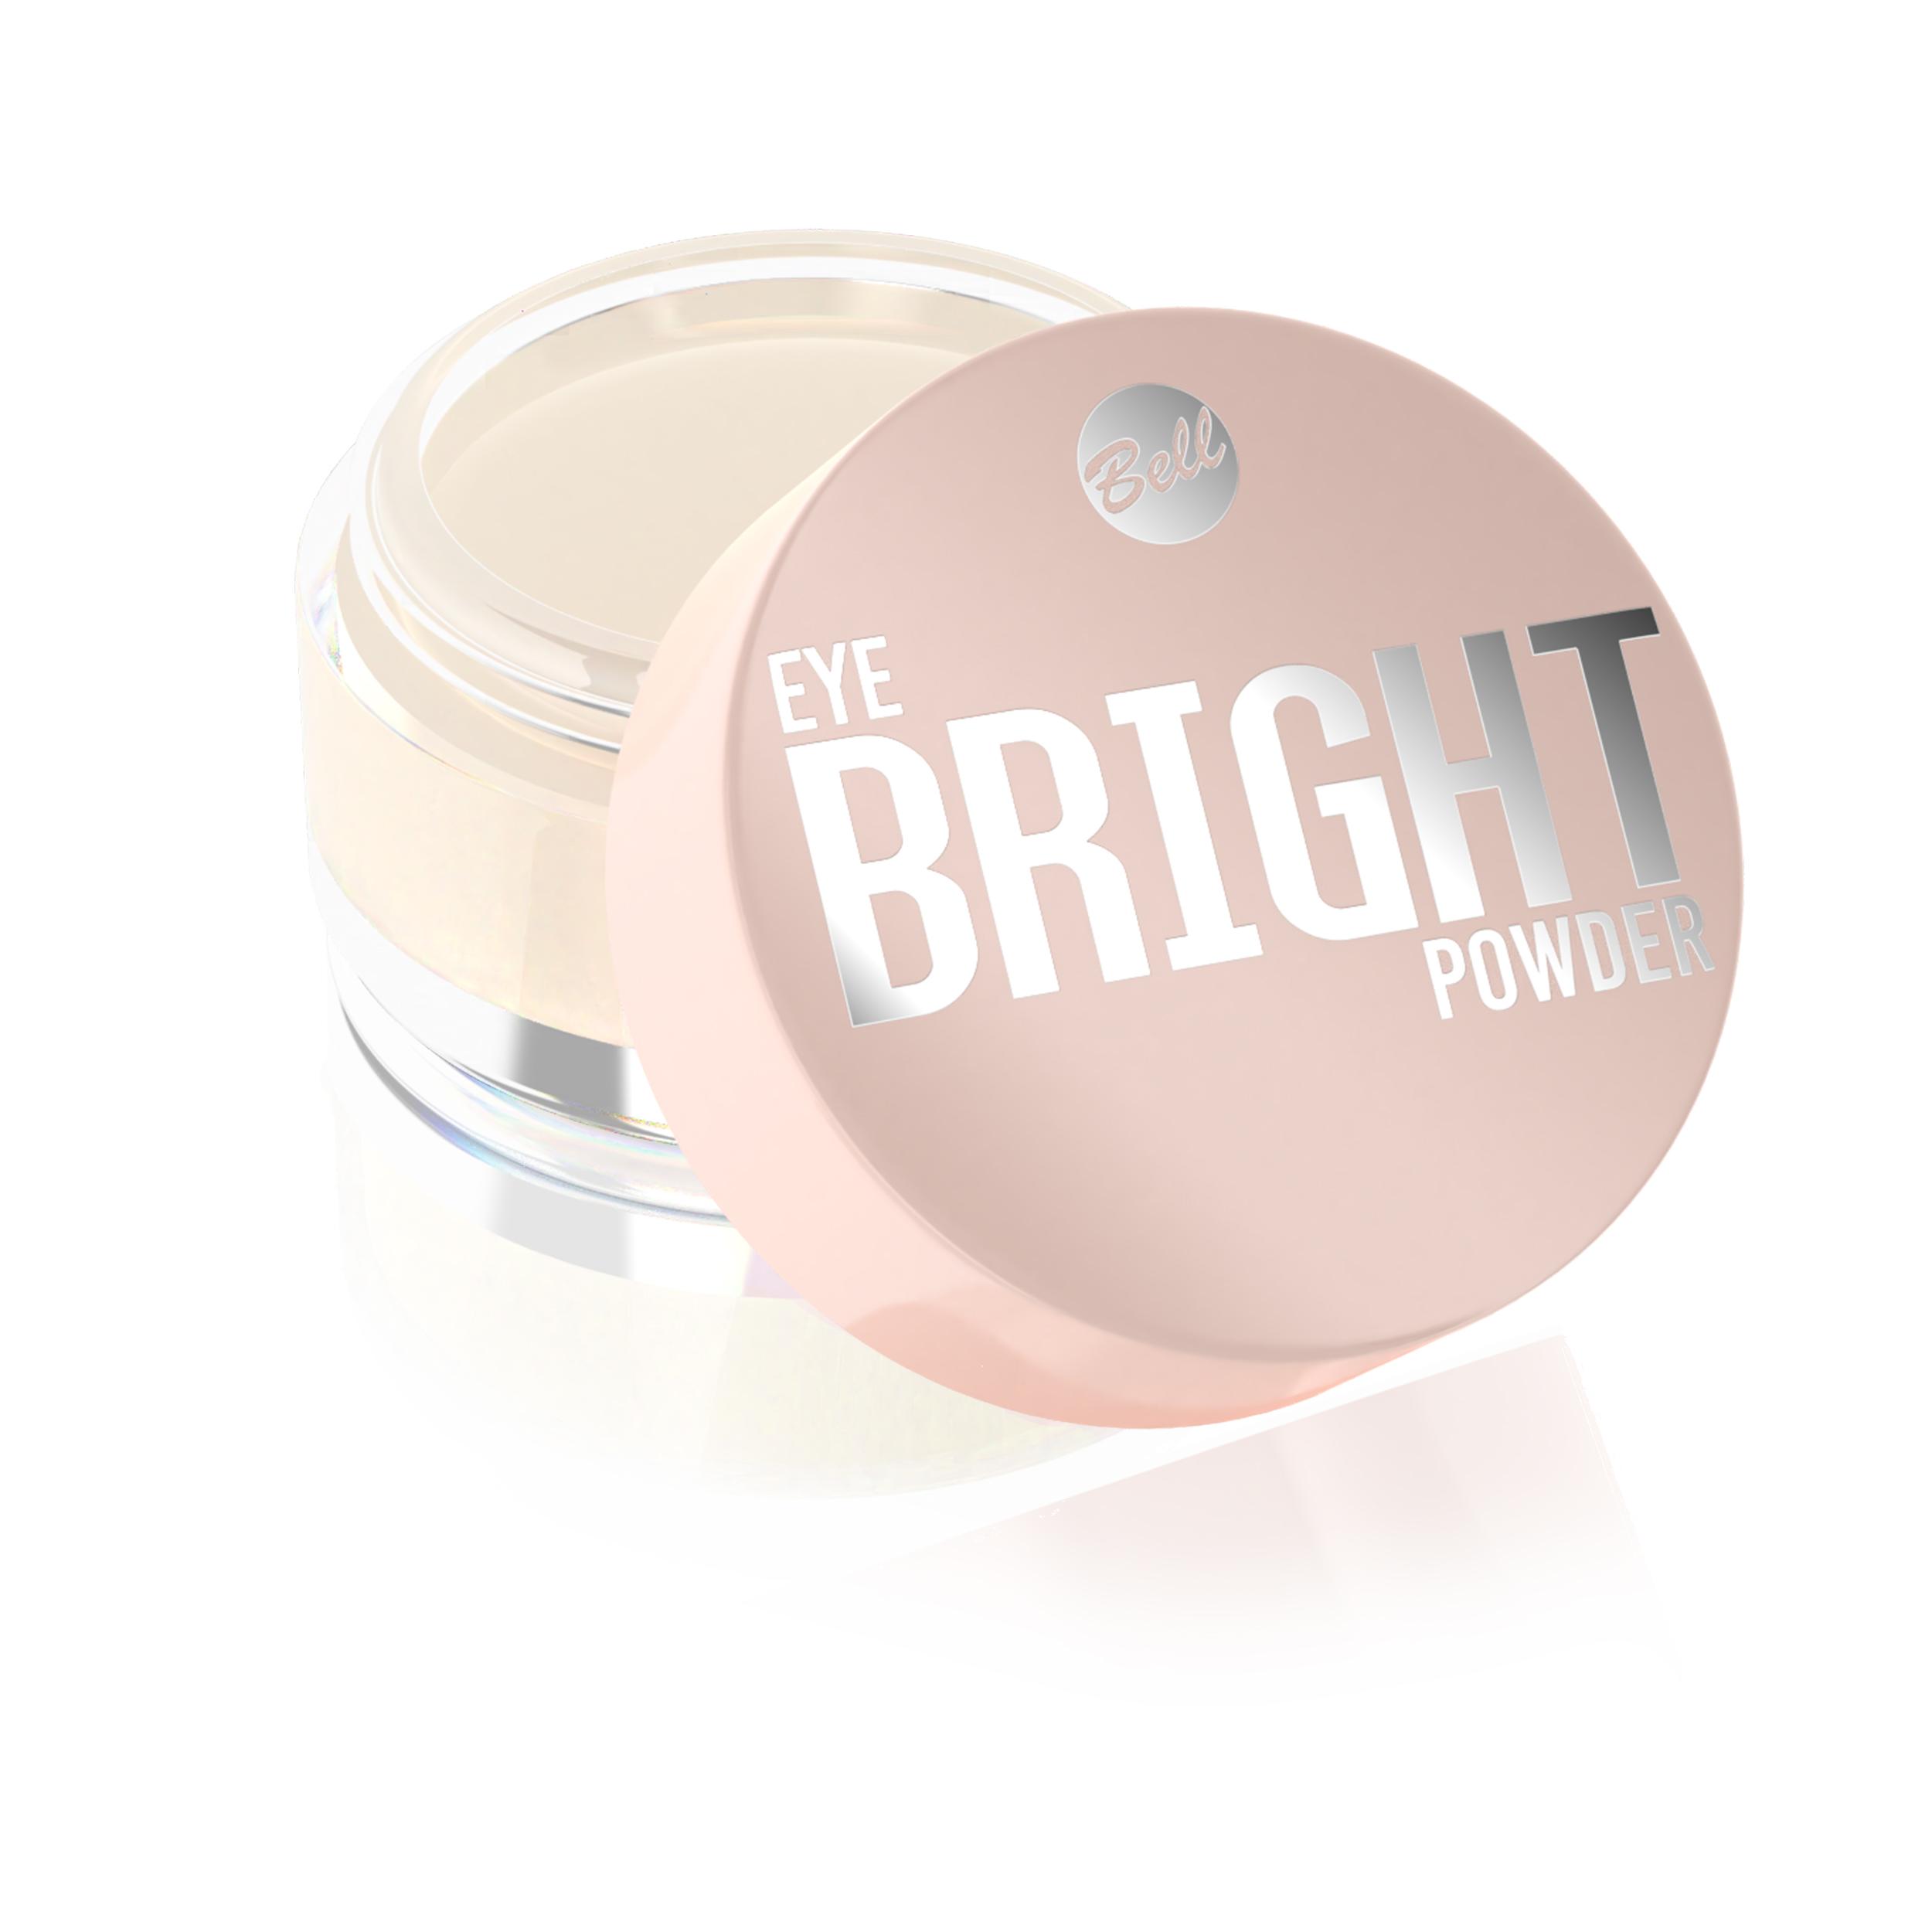 Bright Eye Powder